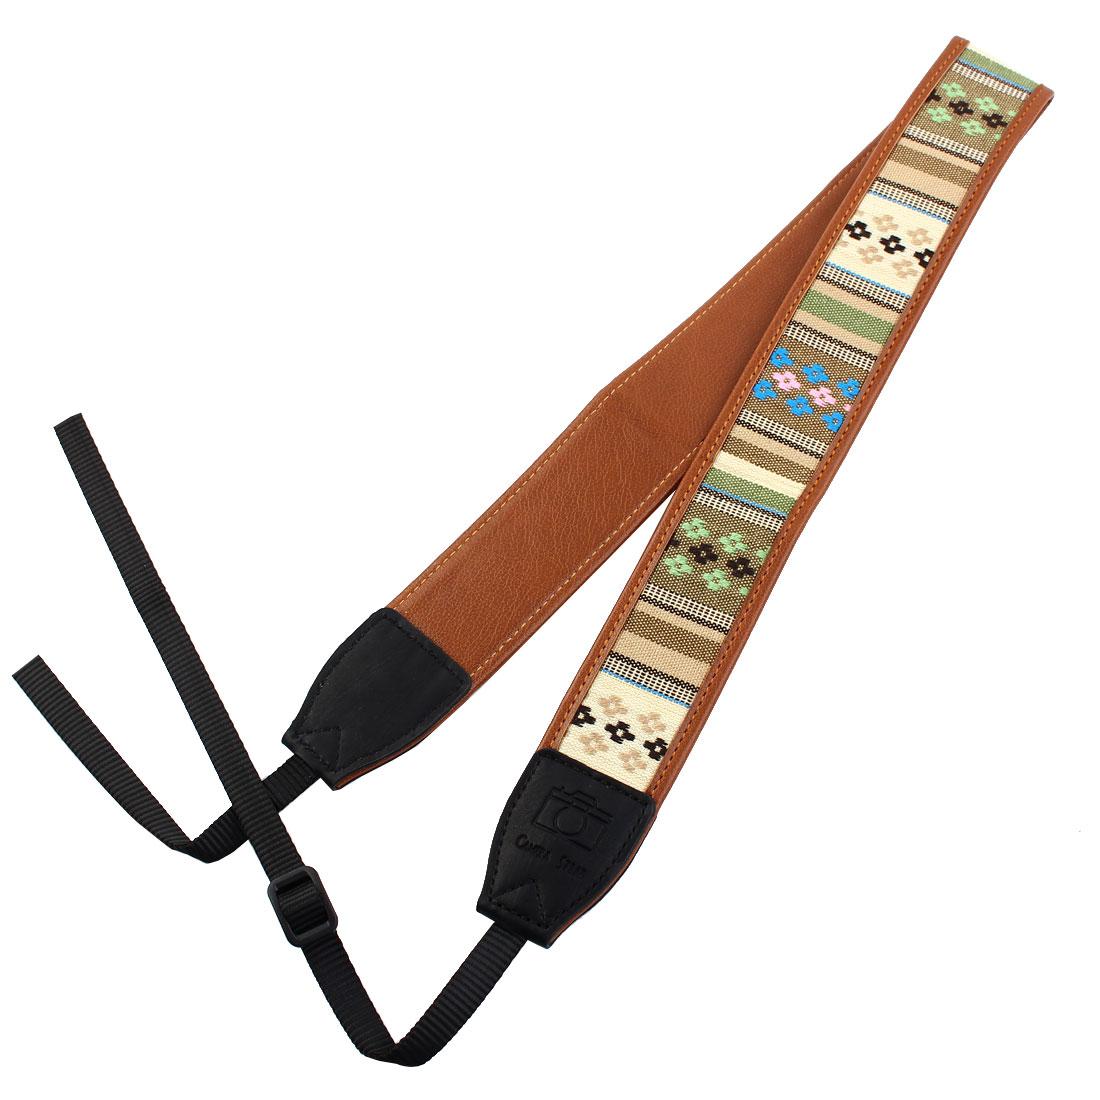 SHETU Authorized Universal Faux Leather Camera Shoulder Neck Strap for SLR DSLR